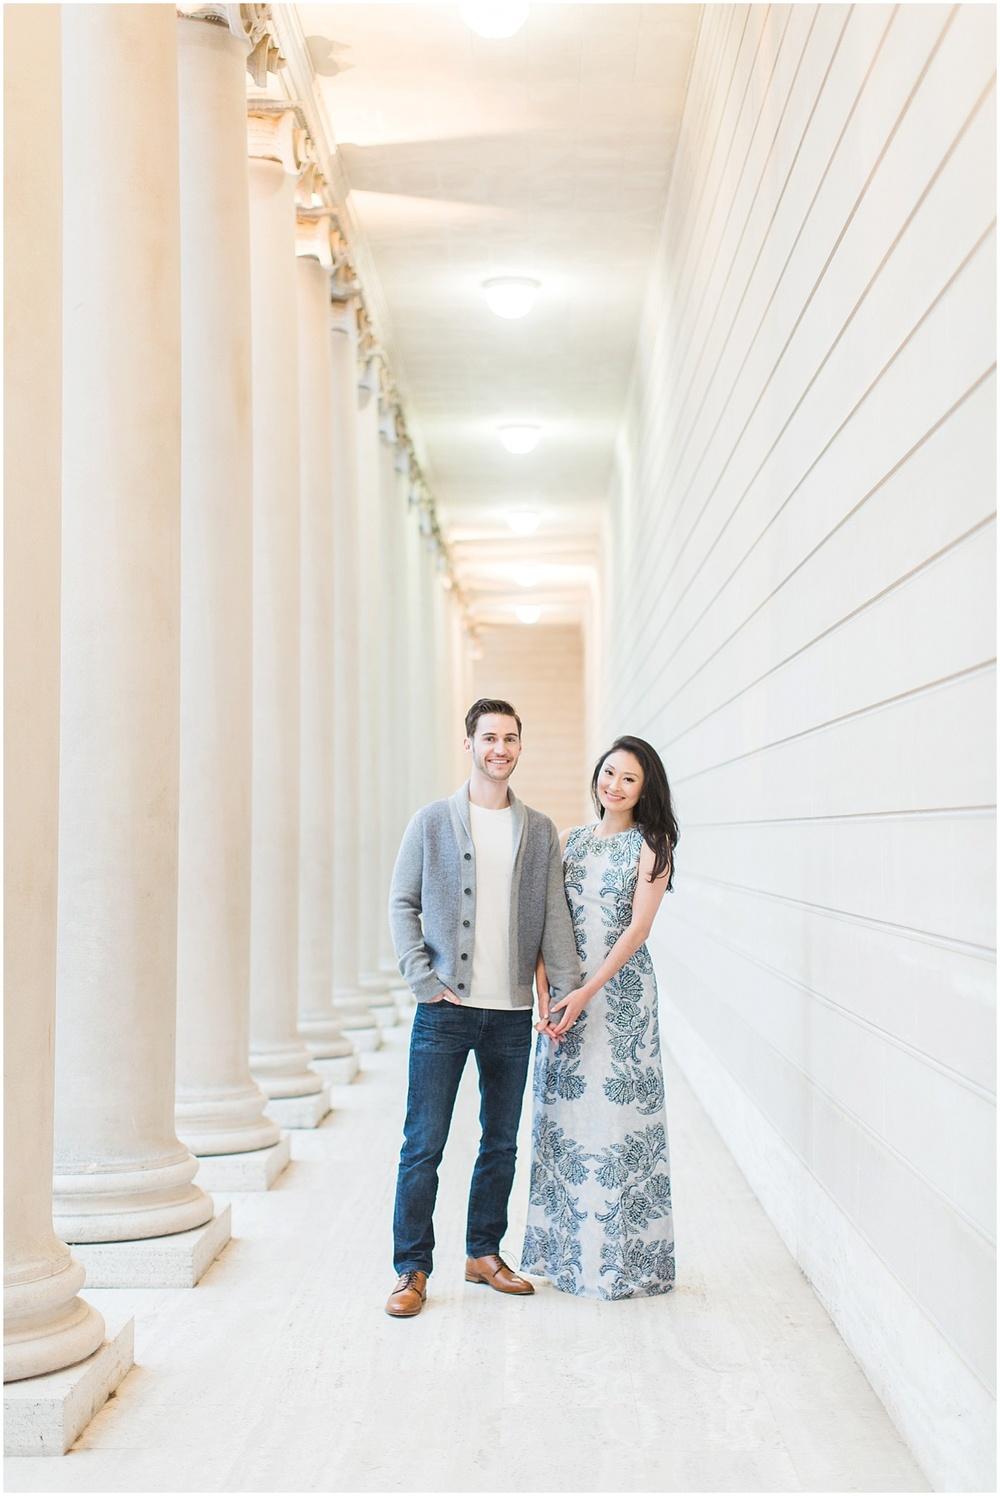 San_Francisco_Legion_of_Honor_Wedding_Photo-08.jpg